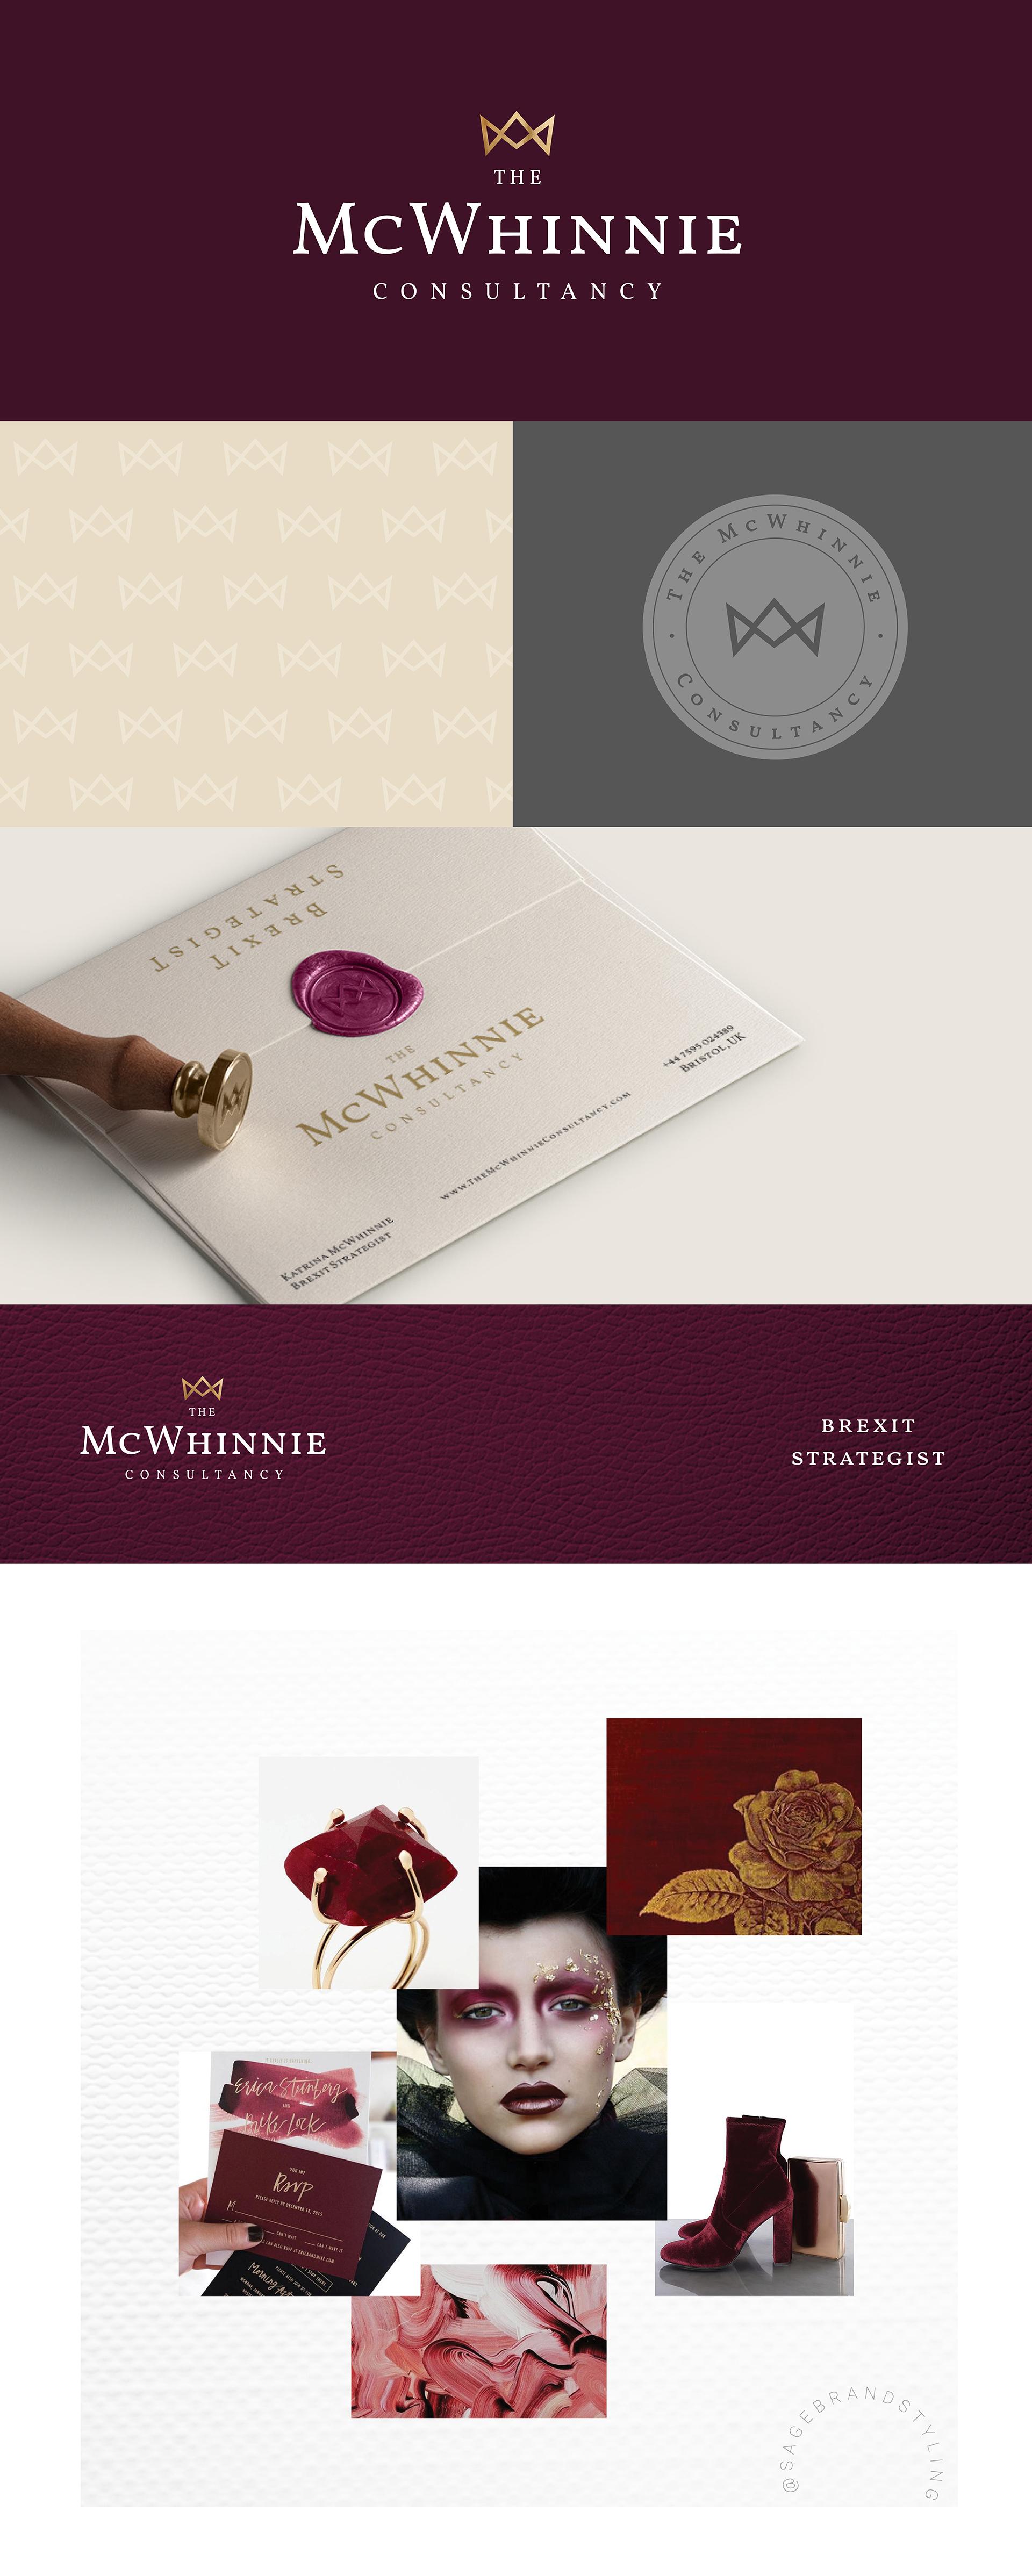 McWhinnie Branding